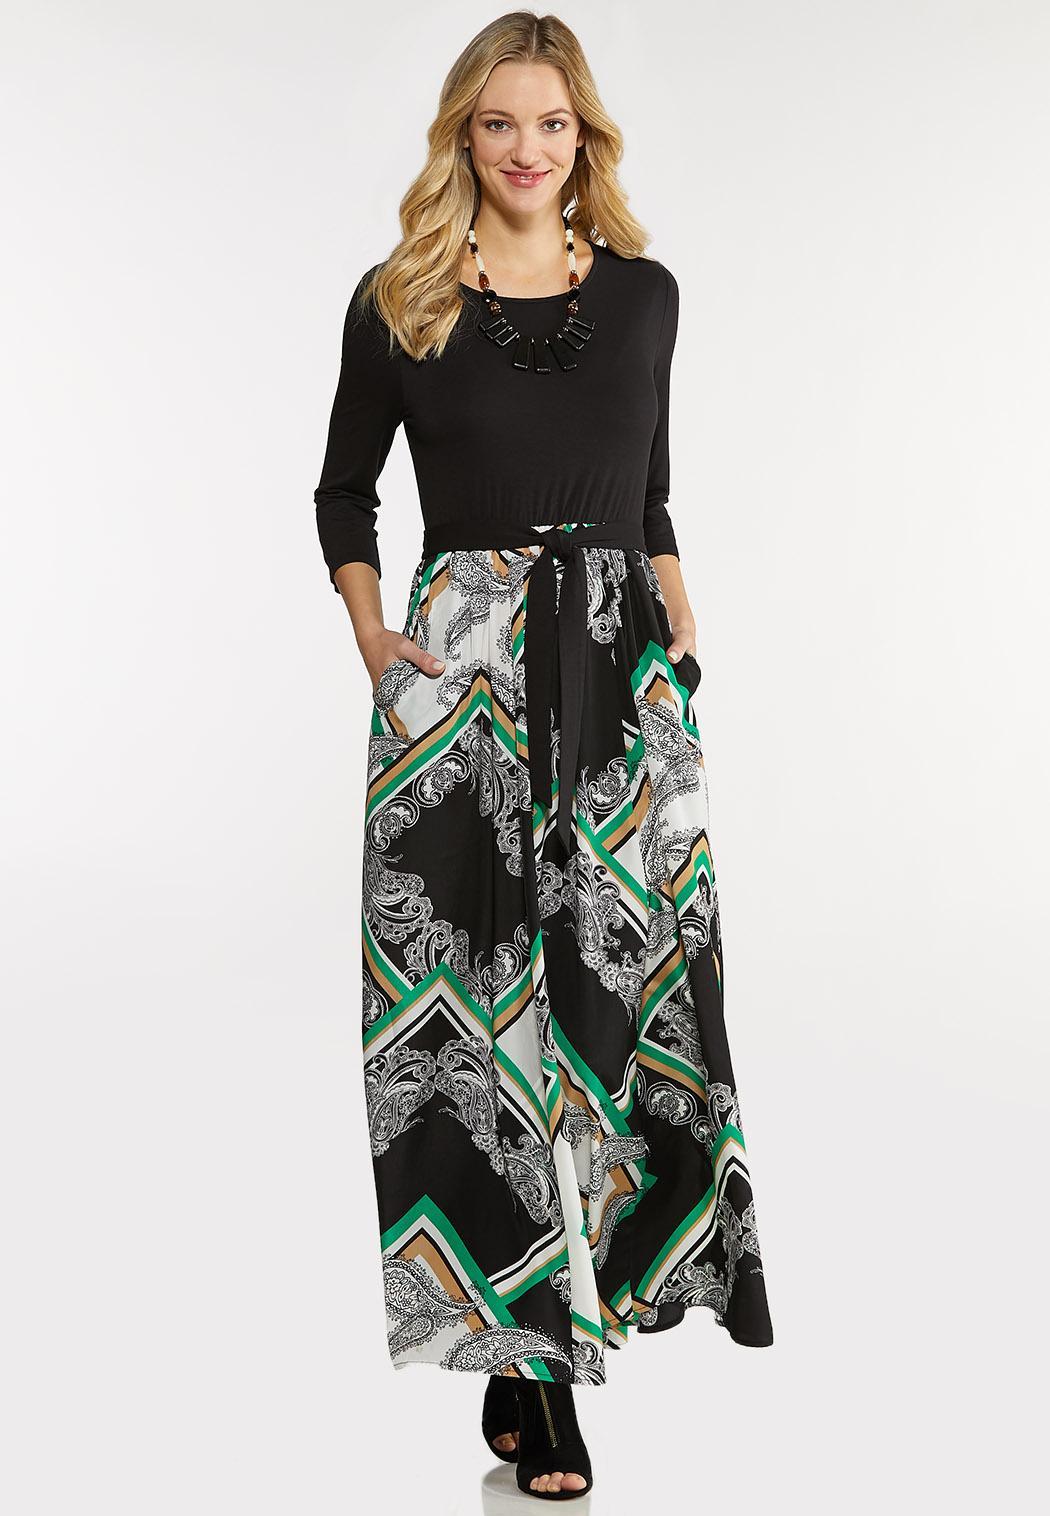 Plus Size Silky Scarf Maxi Dress Maxi Cato Fashions